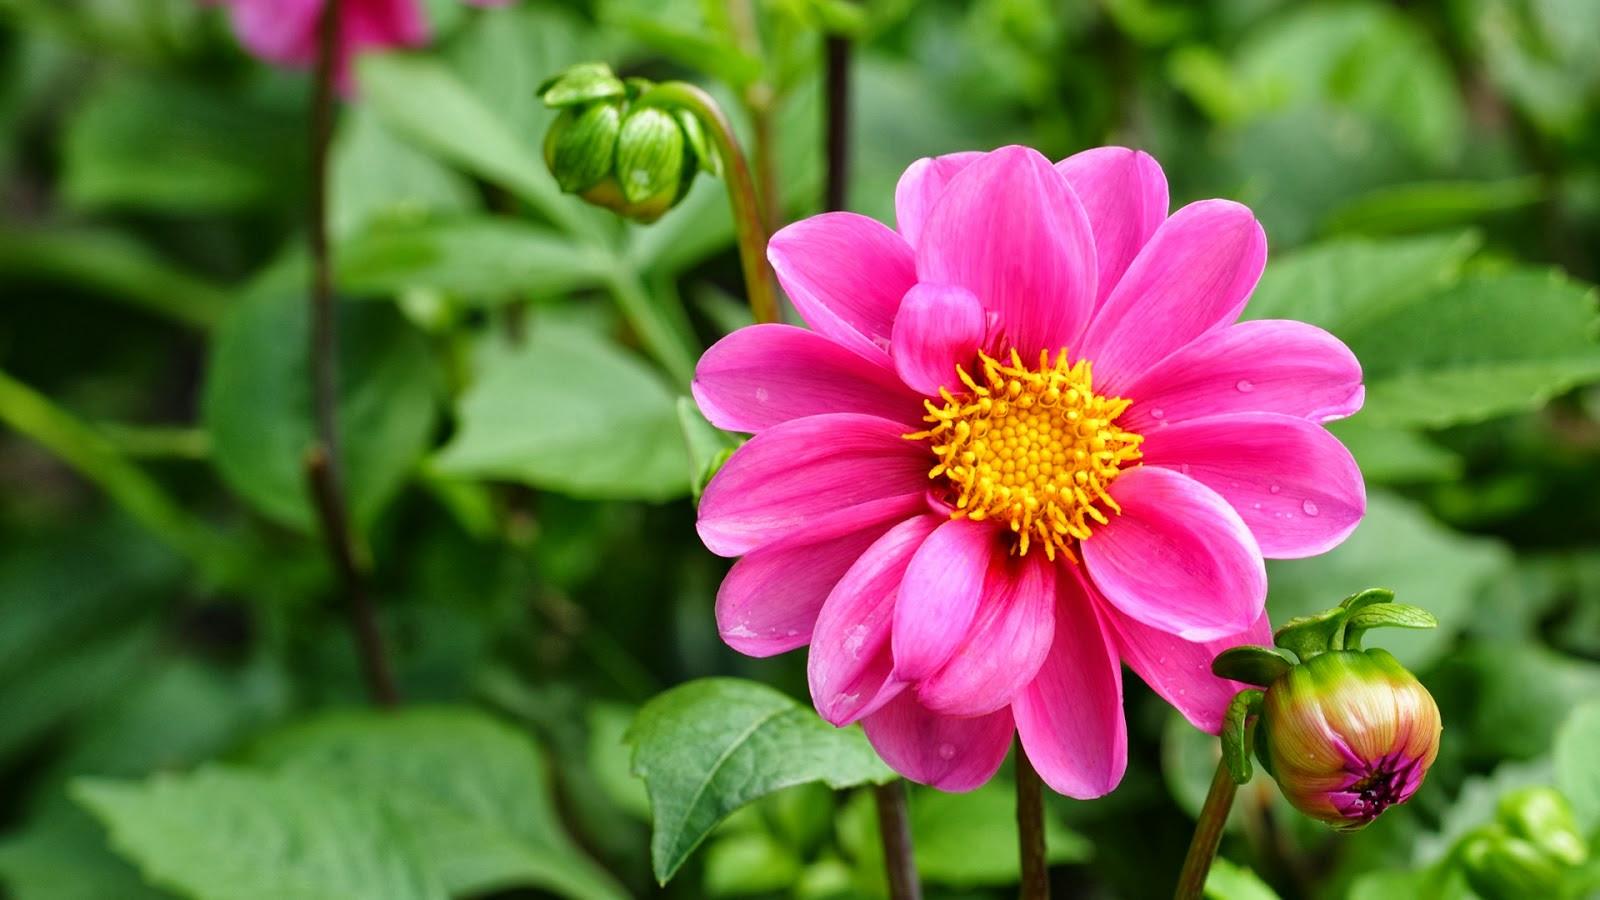 Gambar Bunga Sakura Jepang Yang Indah Pernik DuniaUnder Sakura